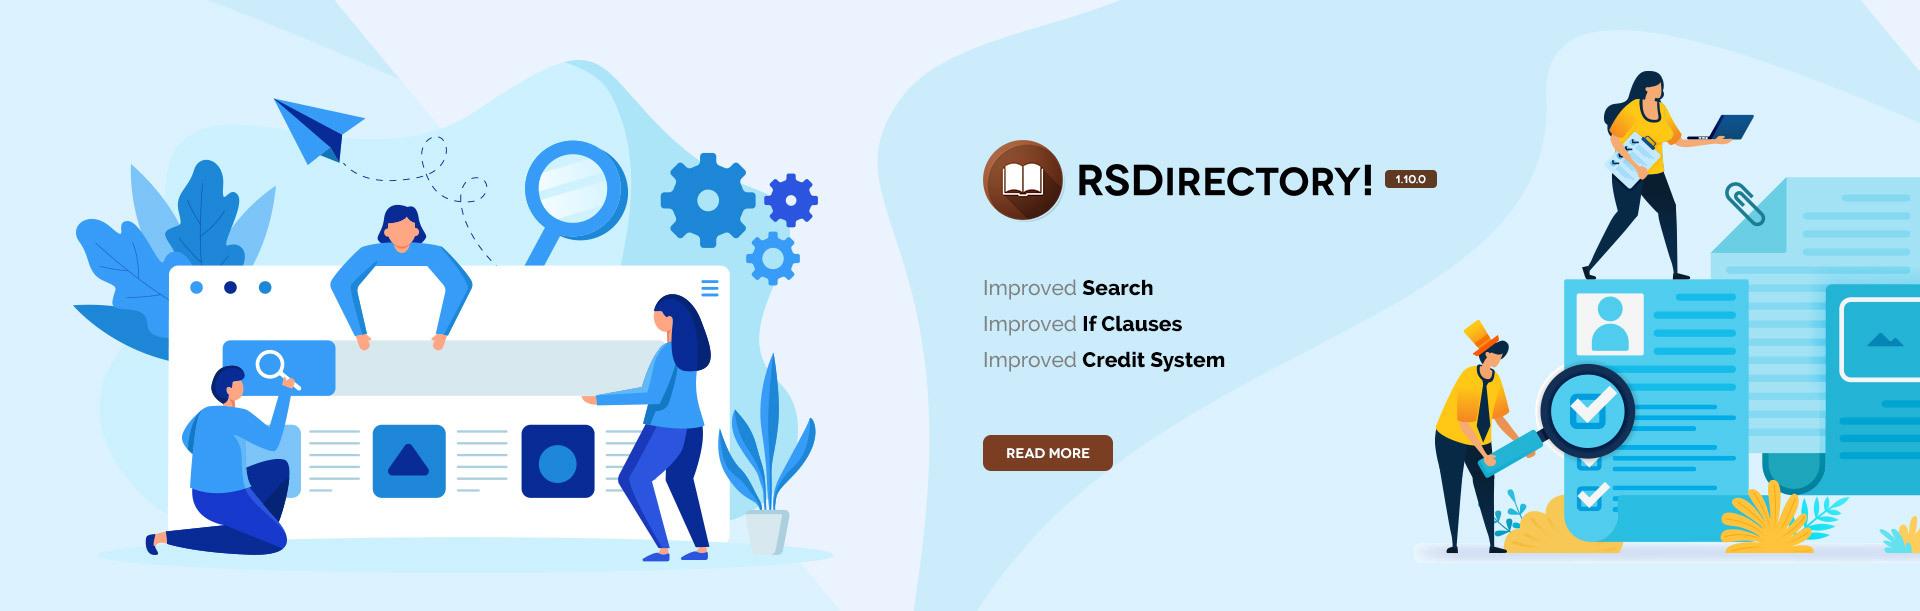 RSDirectory! 1.10.0